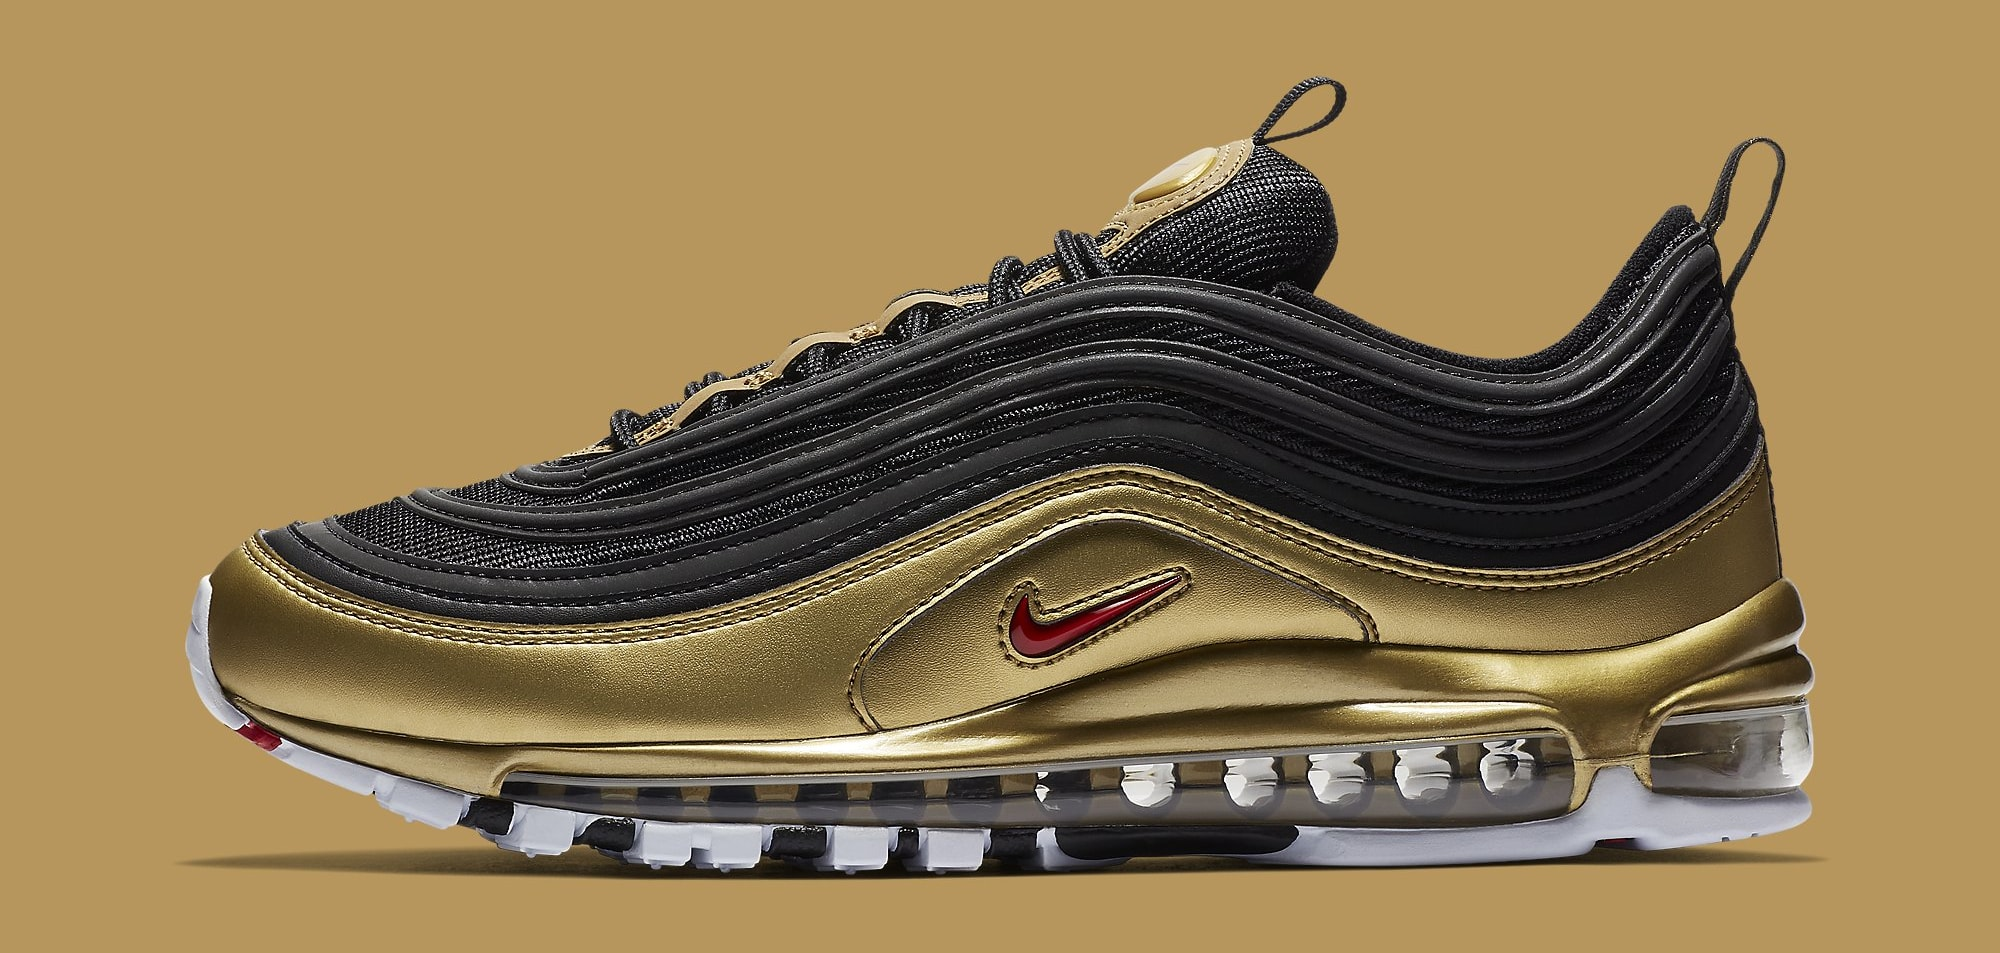 Nike Air Max 97 'Black/Metallic Gold' AT5458-002 (Latera)